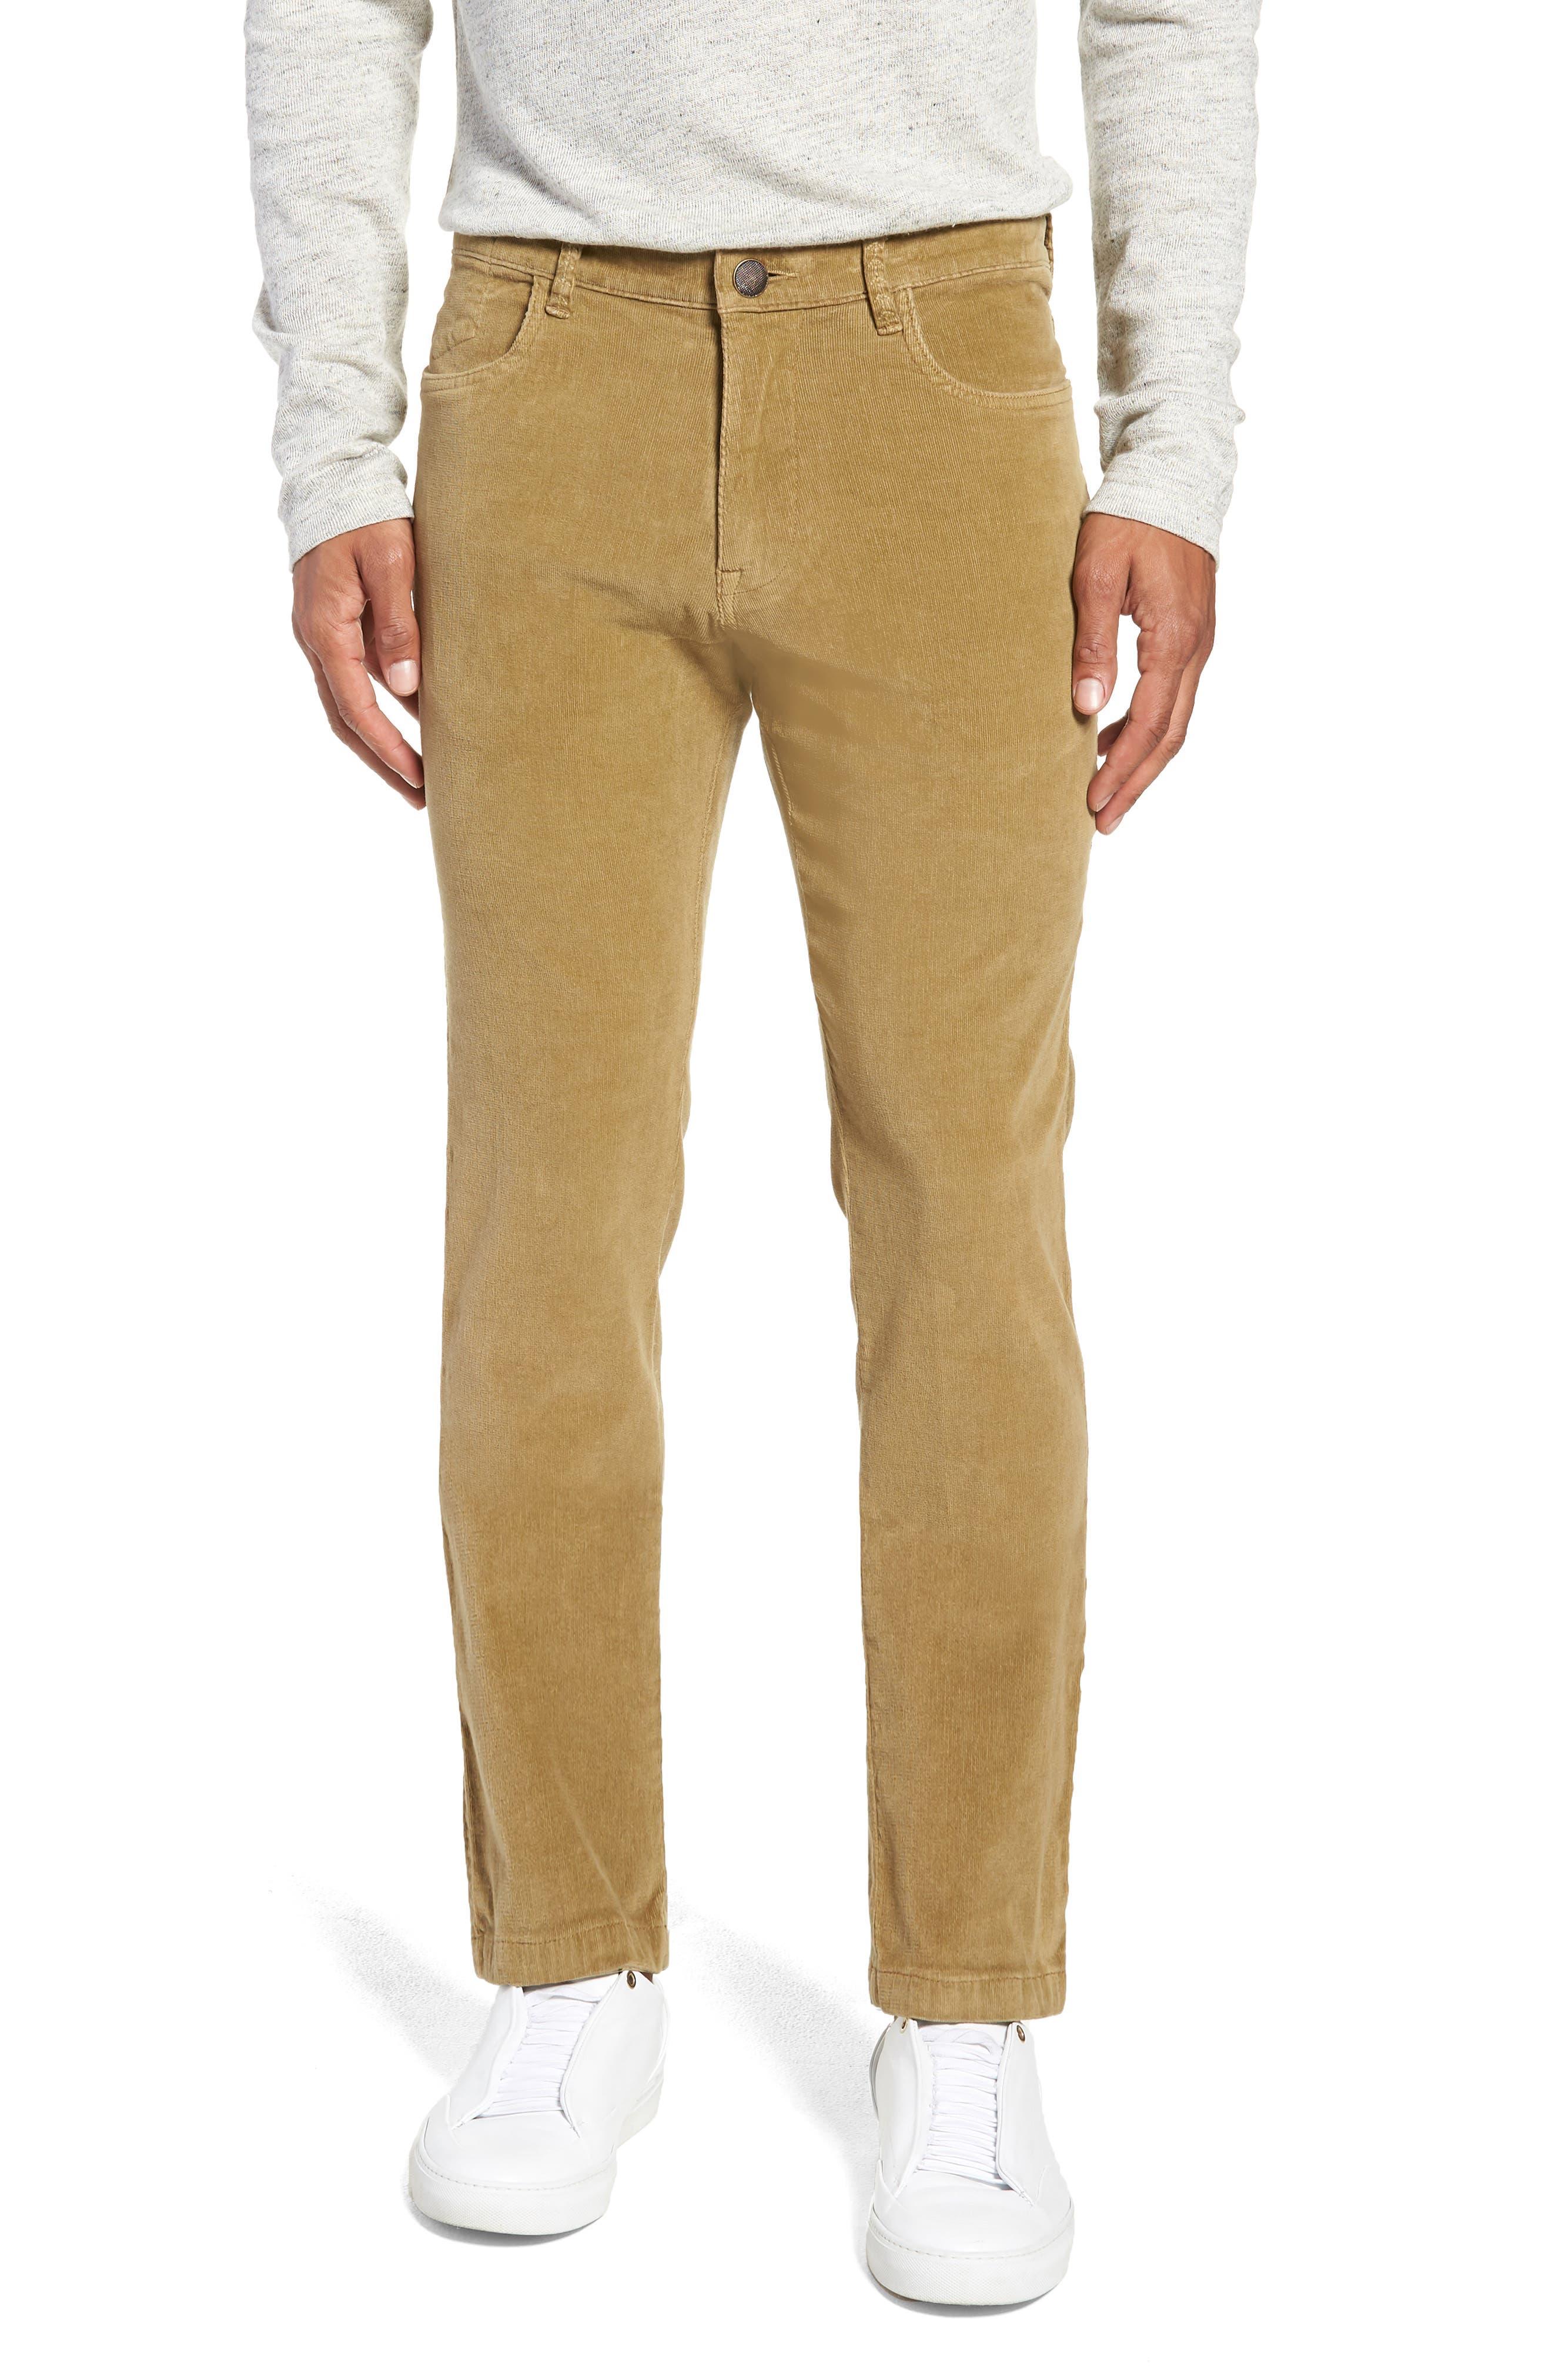 VINTAGE 1946 Modern Fit Stretch Corduroy Pants in British Tan